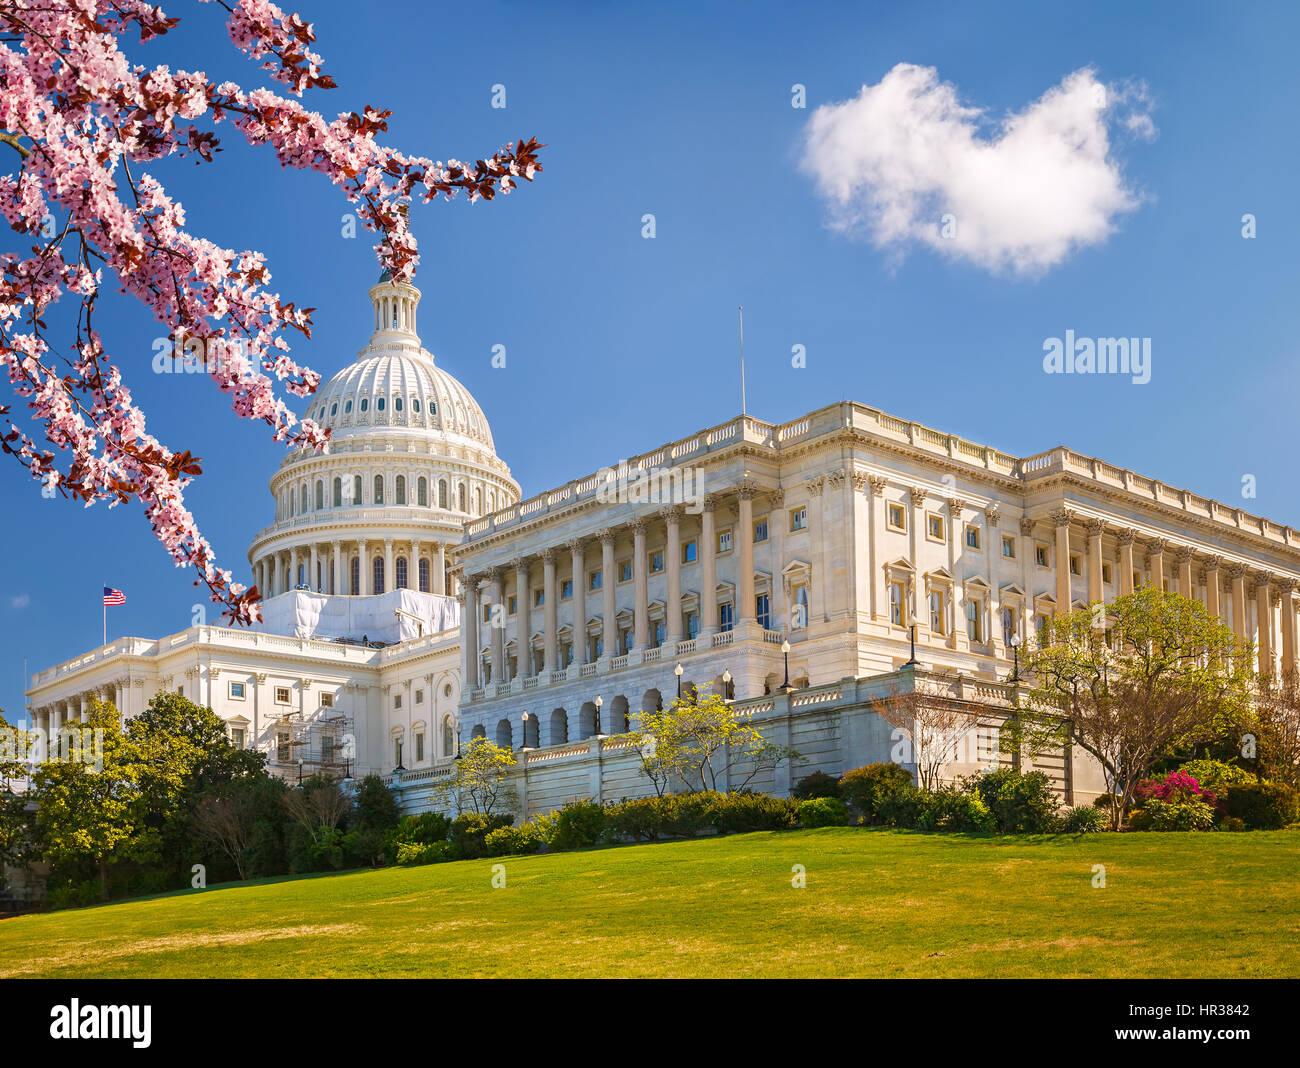 U.S. Capitol am sonnigen Frühlingstag Stockbild